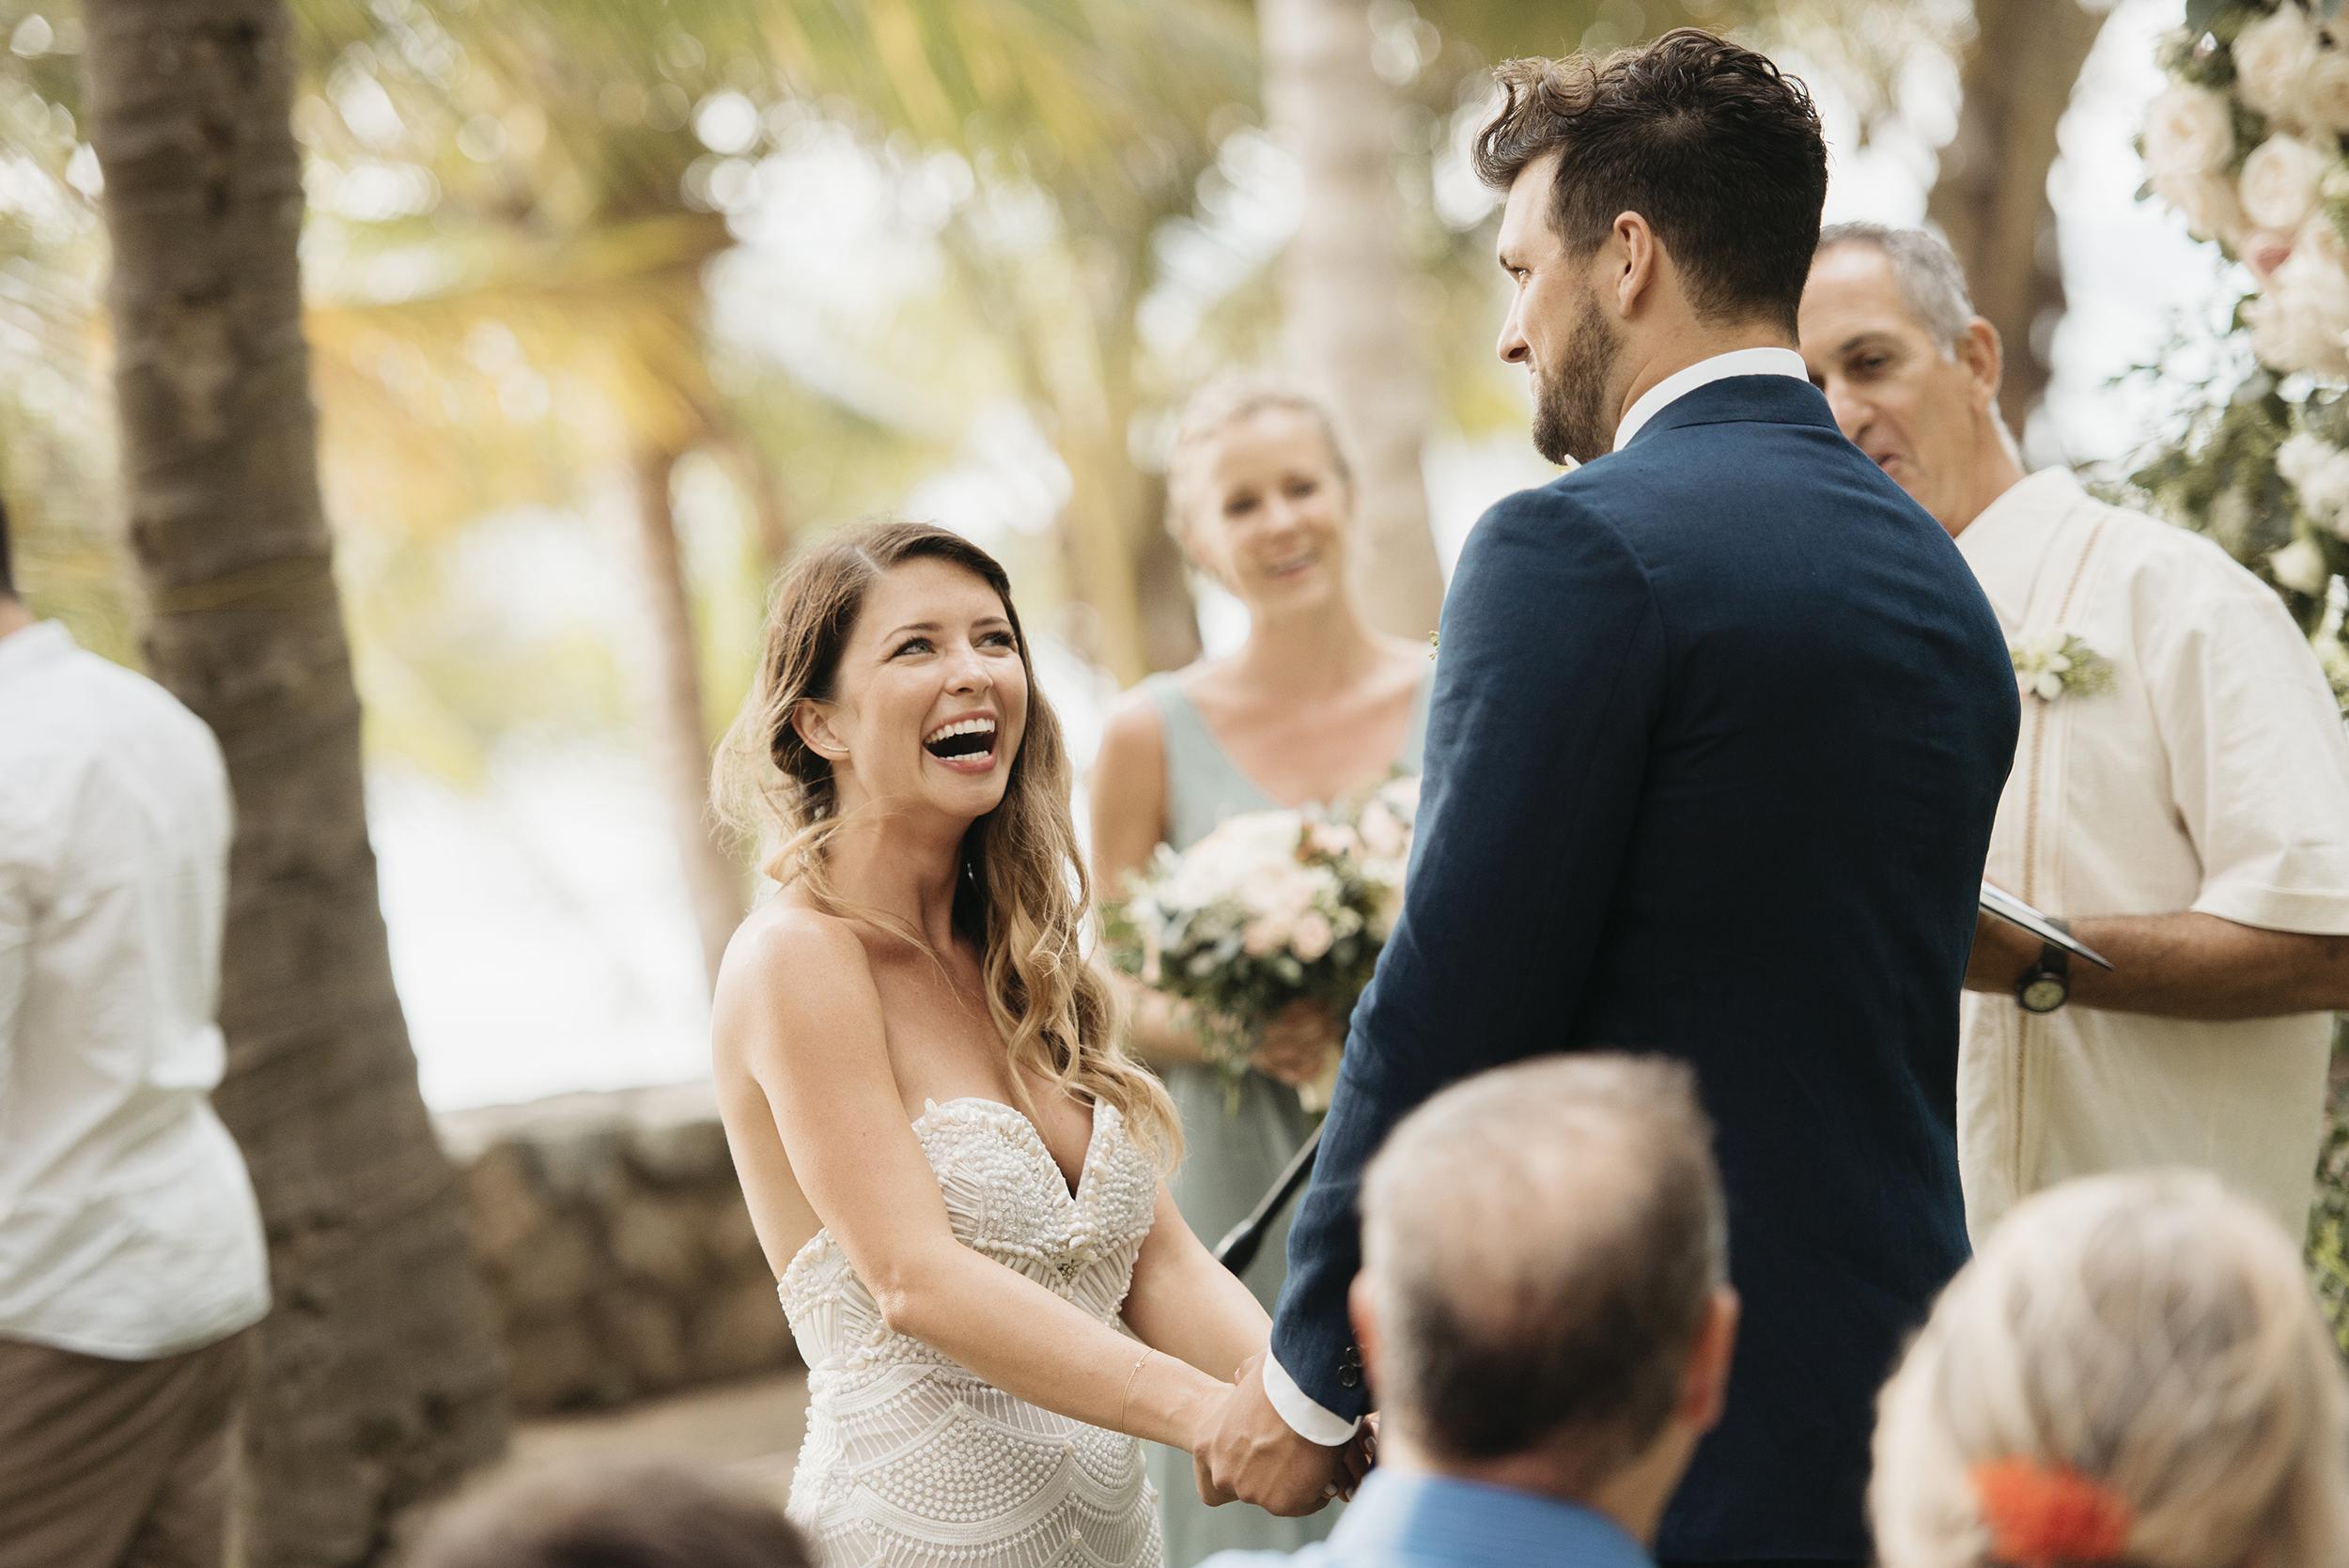 Colby-and-Jess-Intimate-Destination-Wedding-Sayulita-Puerto-Vallarta-Mexico417.jpg